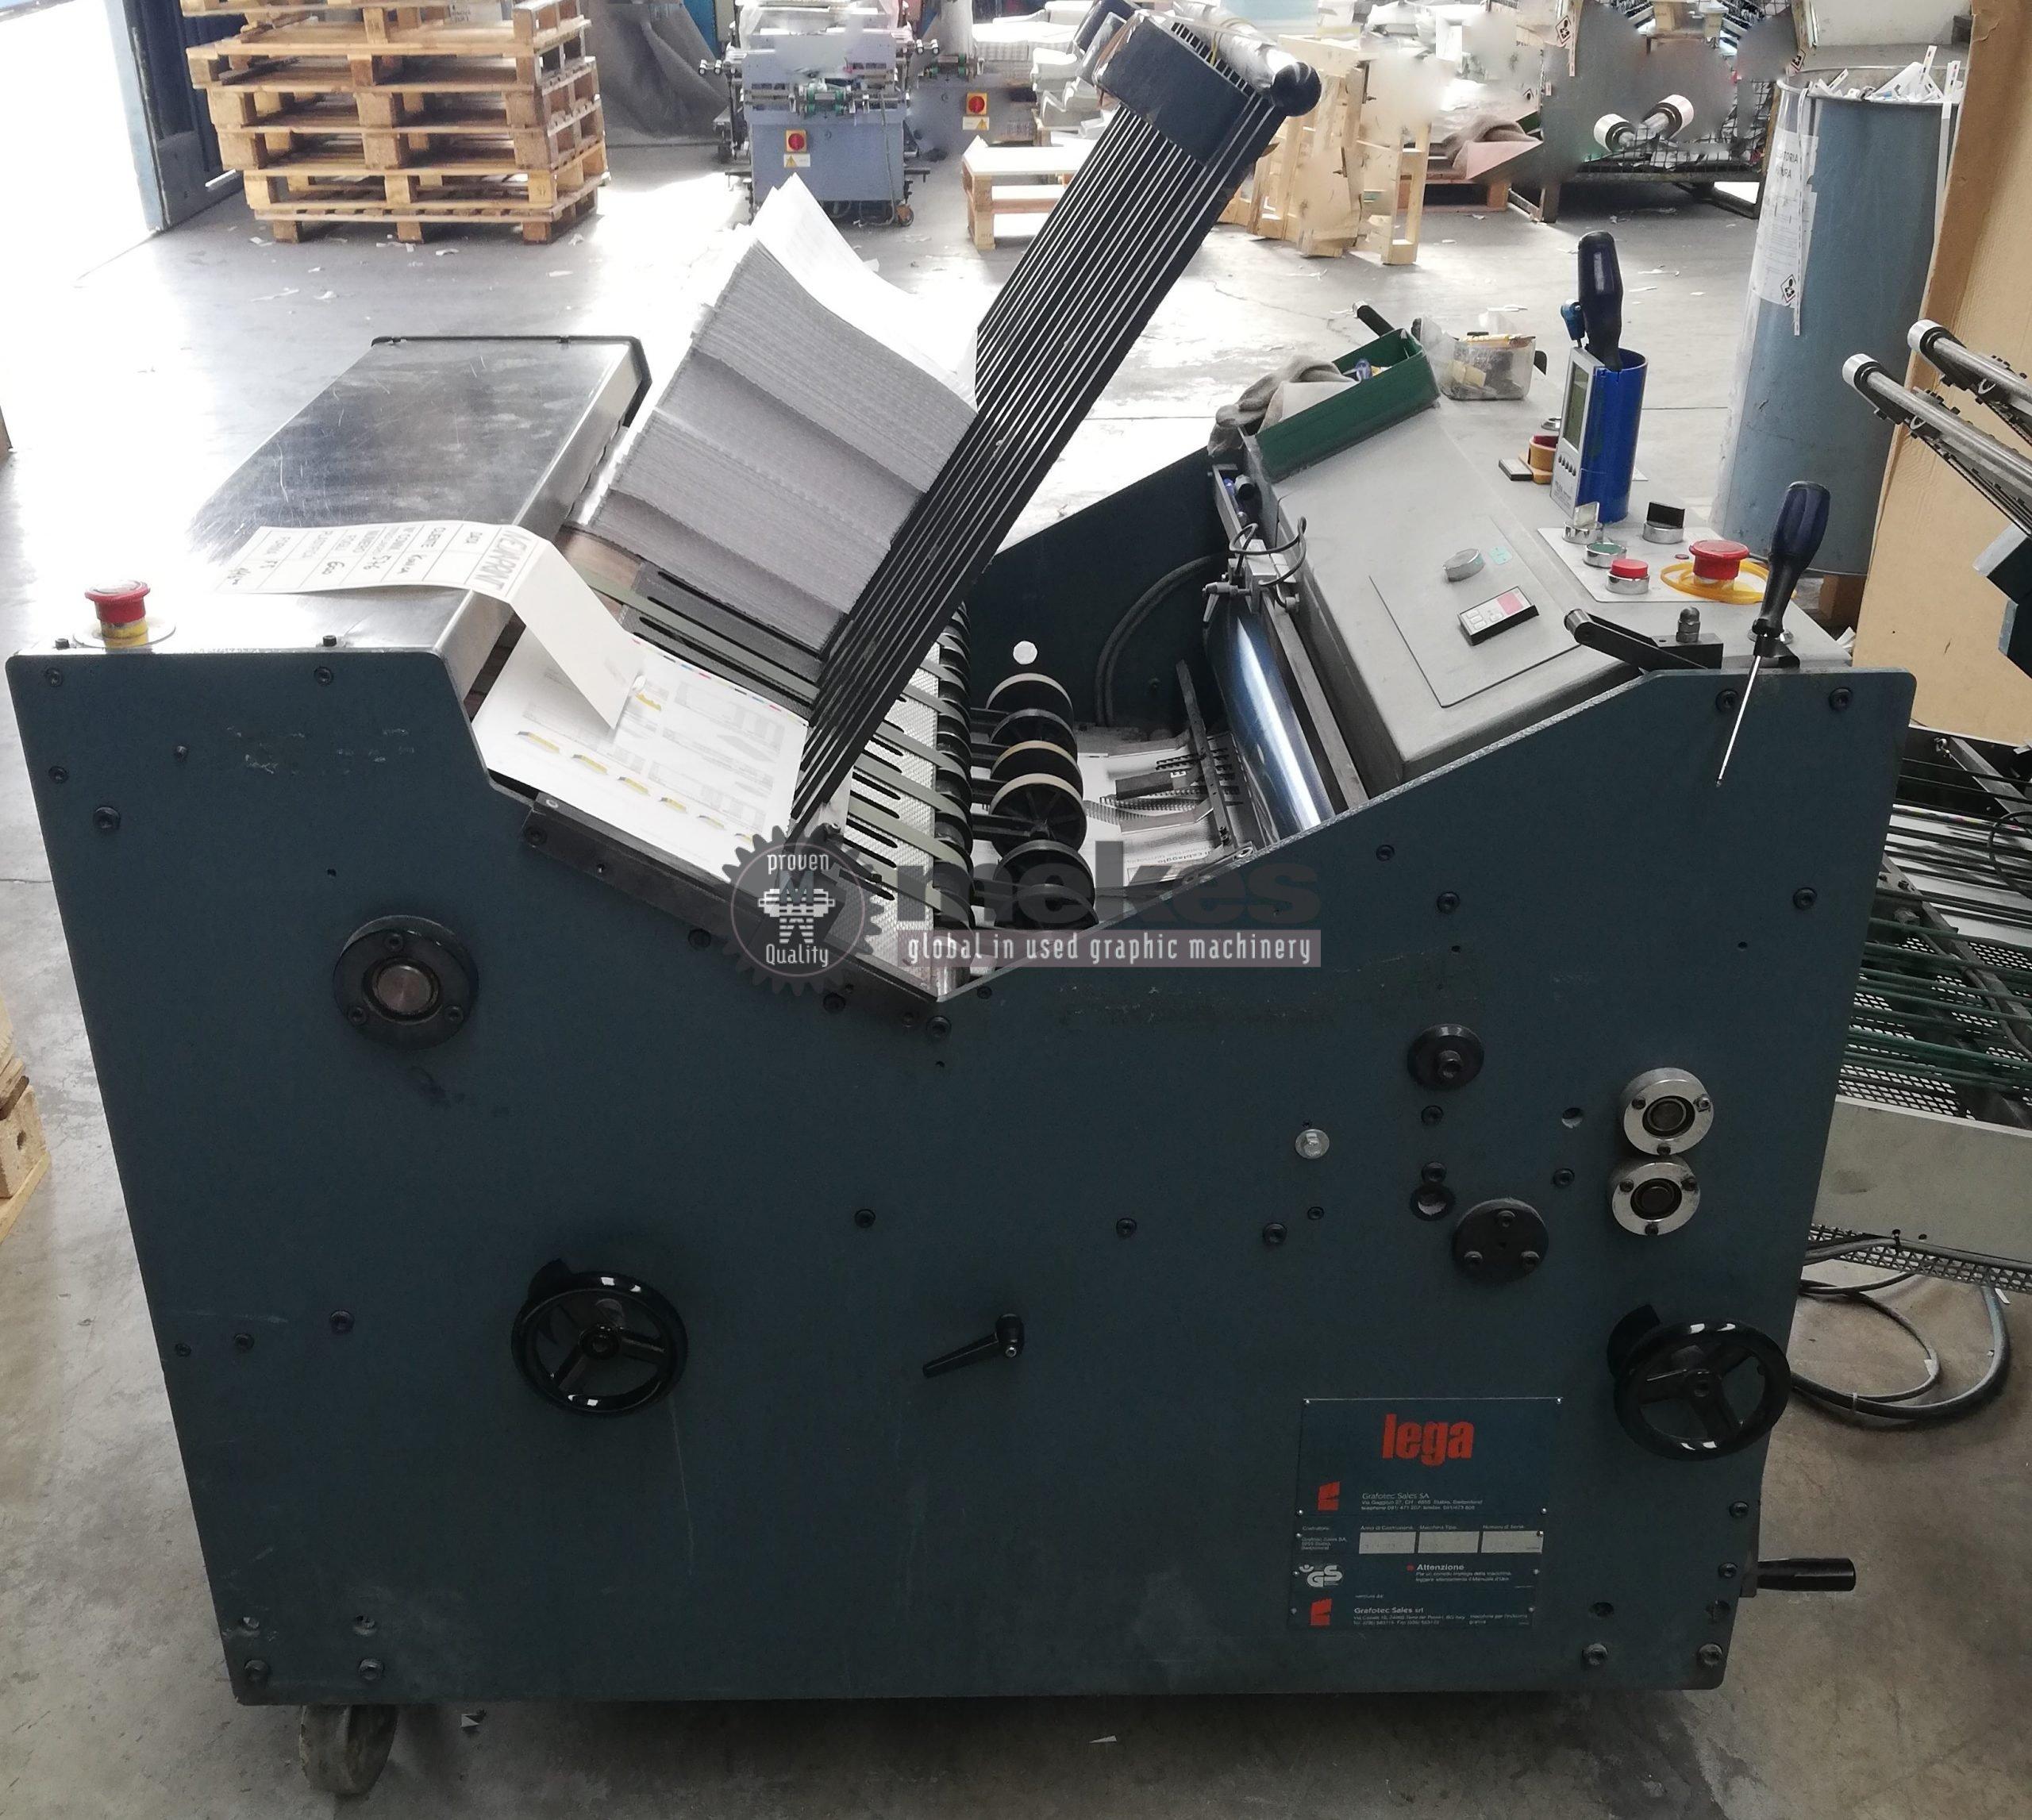 16846 Meccanotecnica Lega 80.5 used folding machine (1)